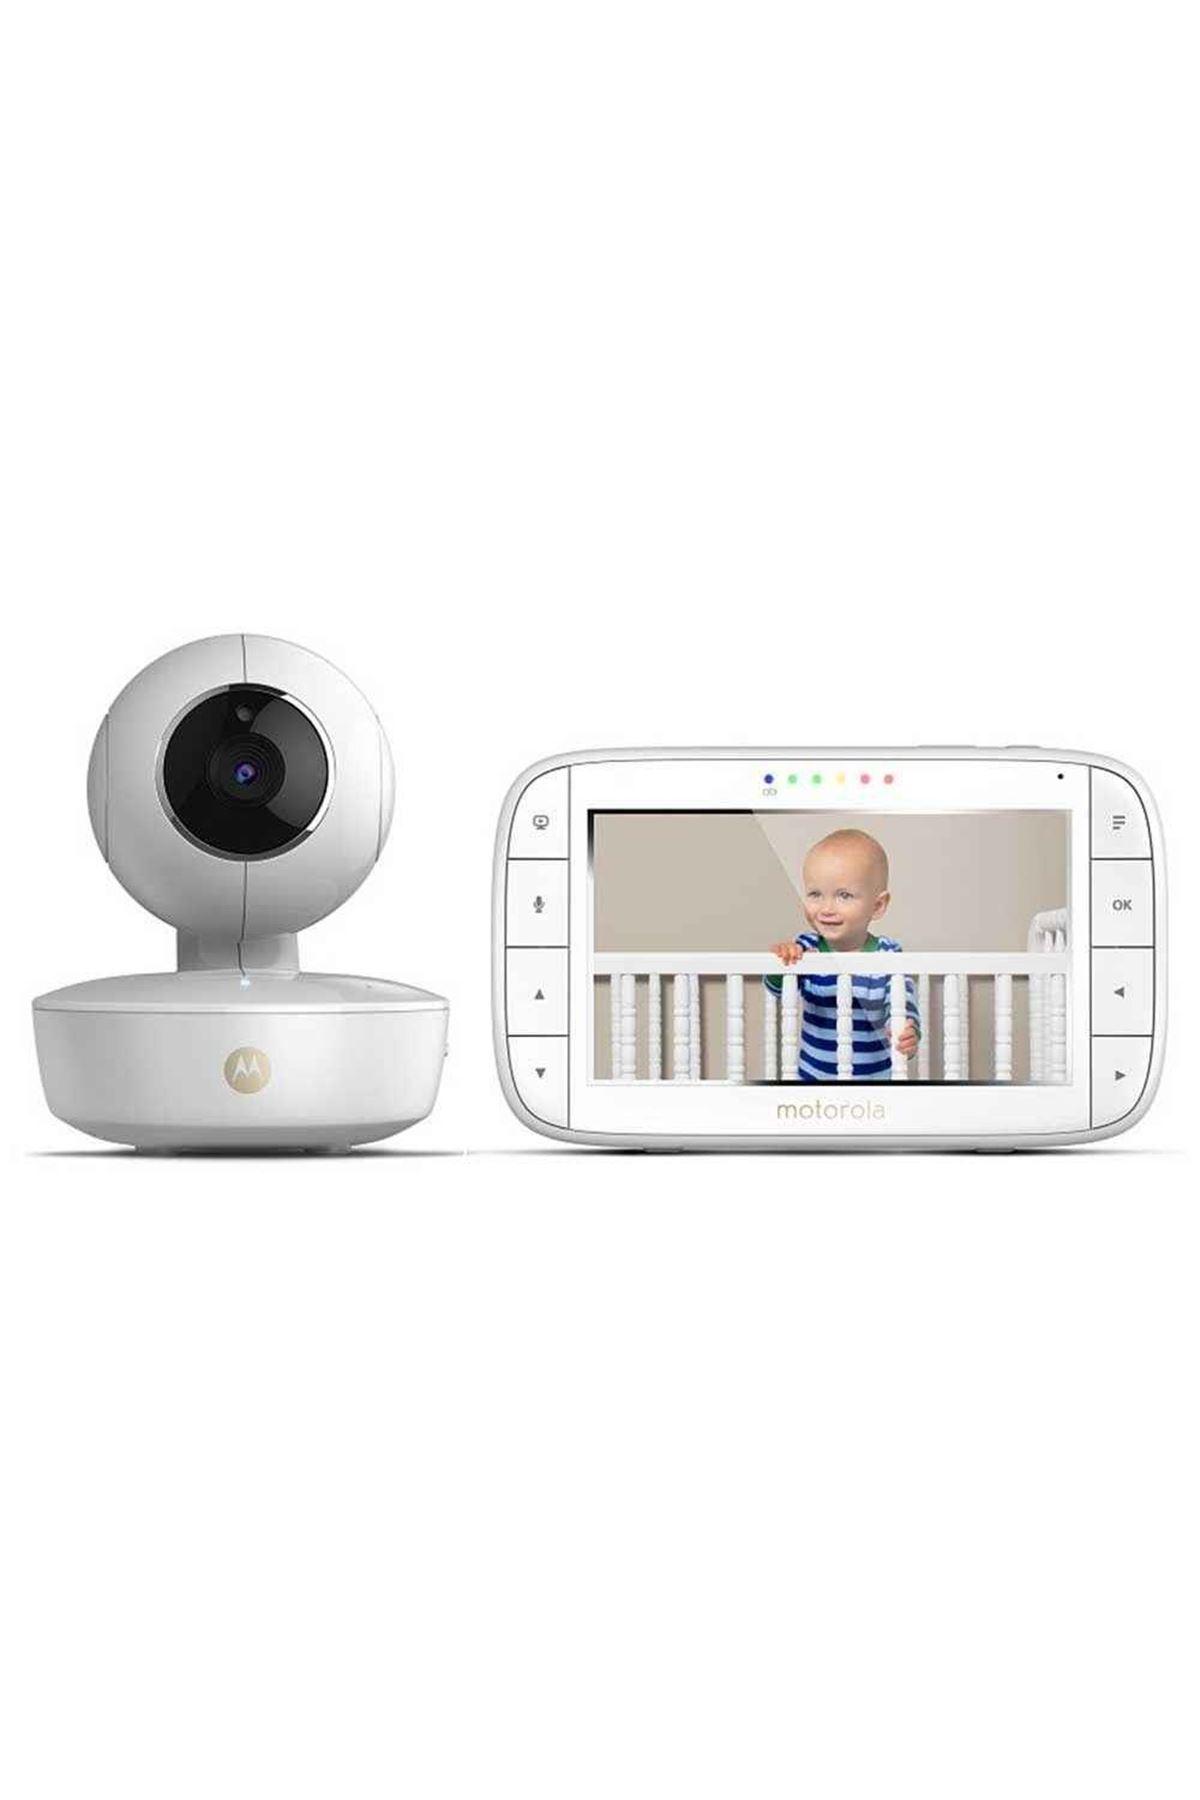 Motorola MBP36XL Dijital Bebek Kamerası 5 İnç LCD Ekran